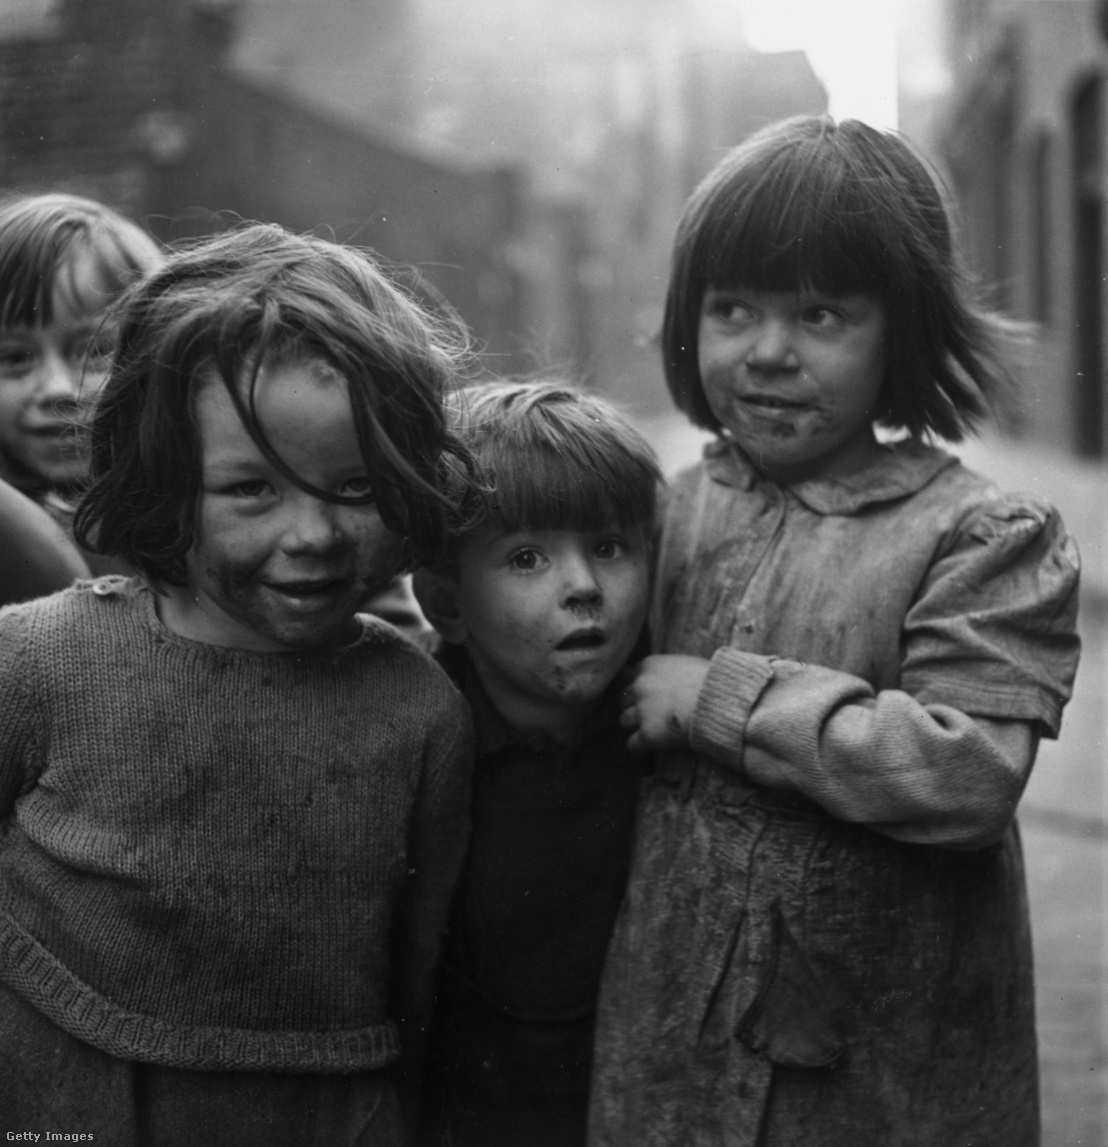 Utcagyerekek Londonban 1947-ben